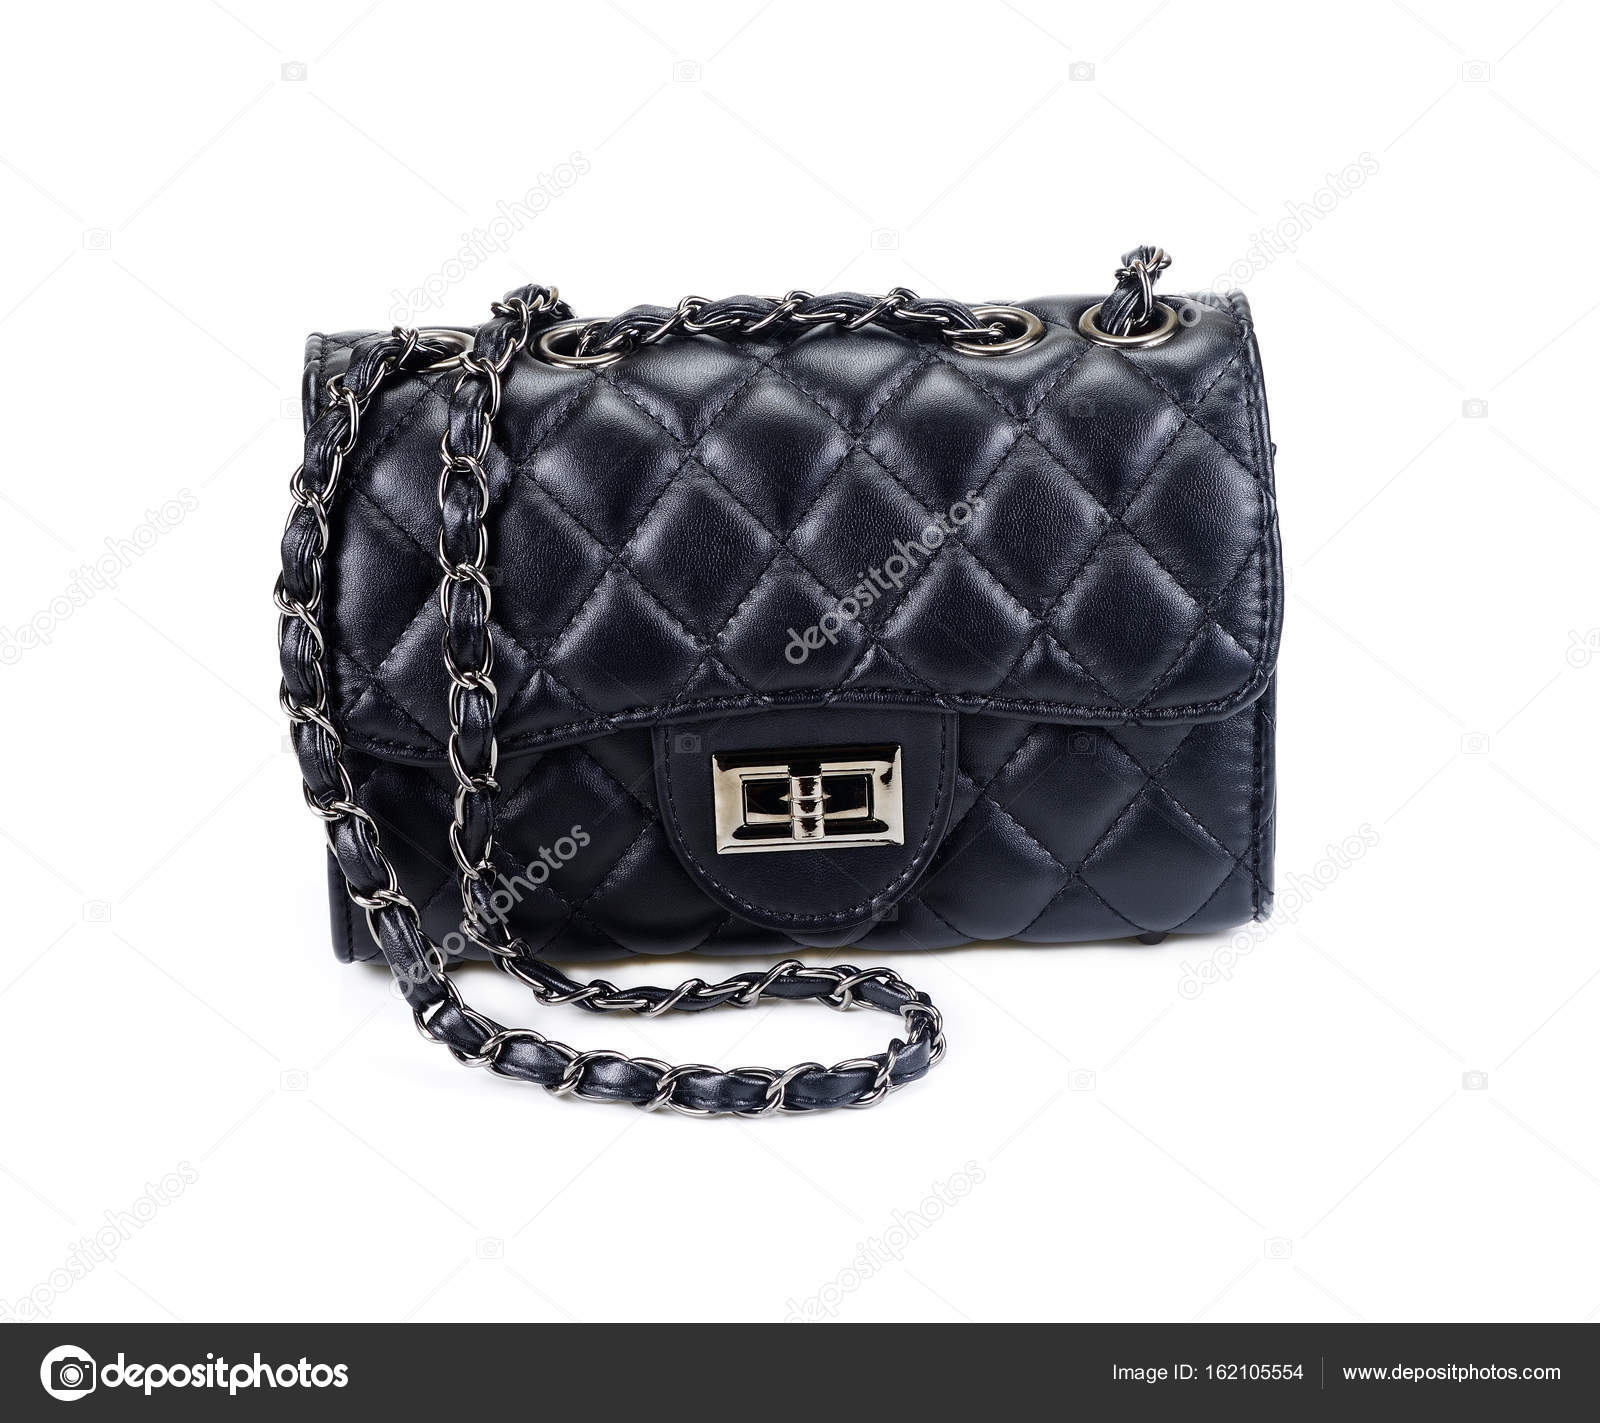 4d6b8420e0 Μαύρη γυναικεία τσάντα που απομονώνονται σε λευκό φόντο. Ωραία και κομψή γυναίκα  τσάντα που απομονώνονται σε λευκό — Εικόνα από big8183 gmail.com